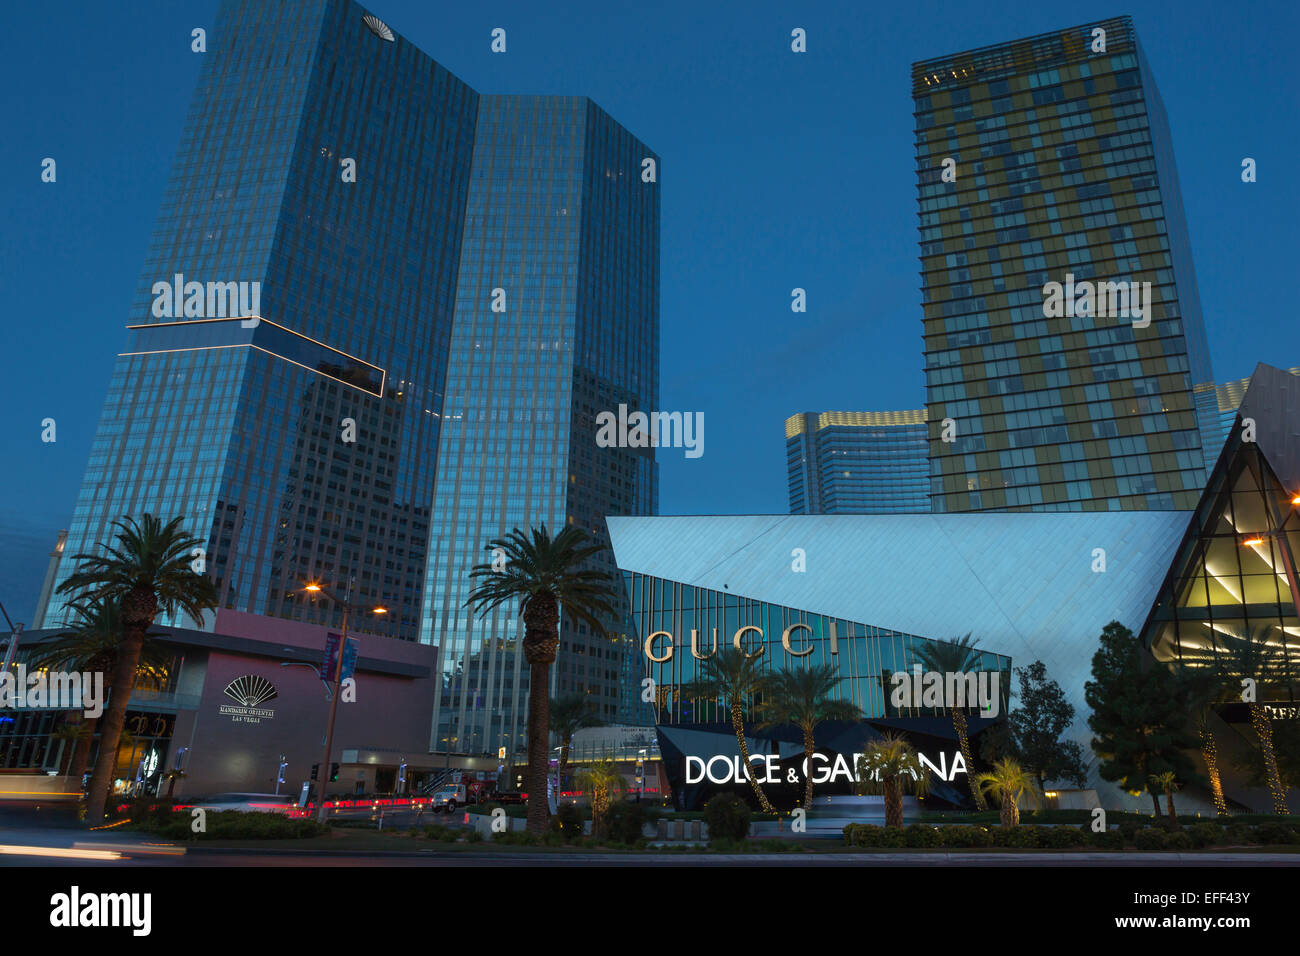 Cosmopolitan Hotel Casino Kristalle Aria City Center Strip Las Vegas